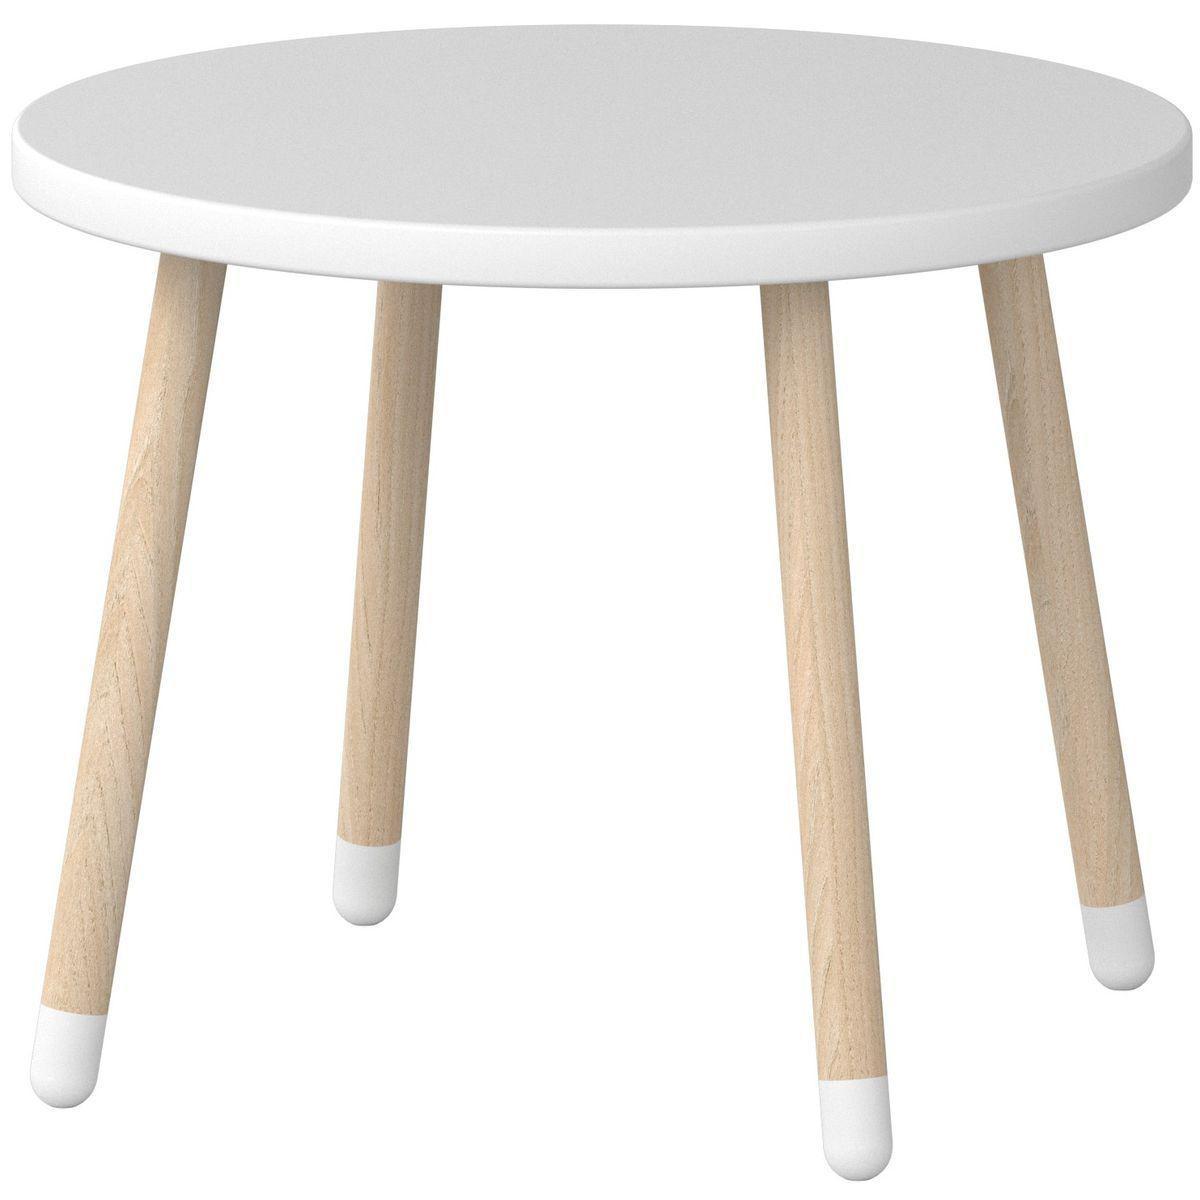 PLAY by Flexa Petite table enfant 60 cm Blanche